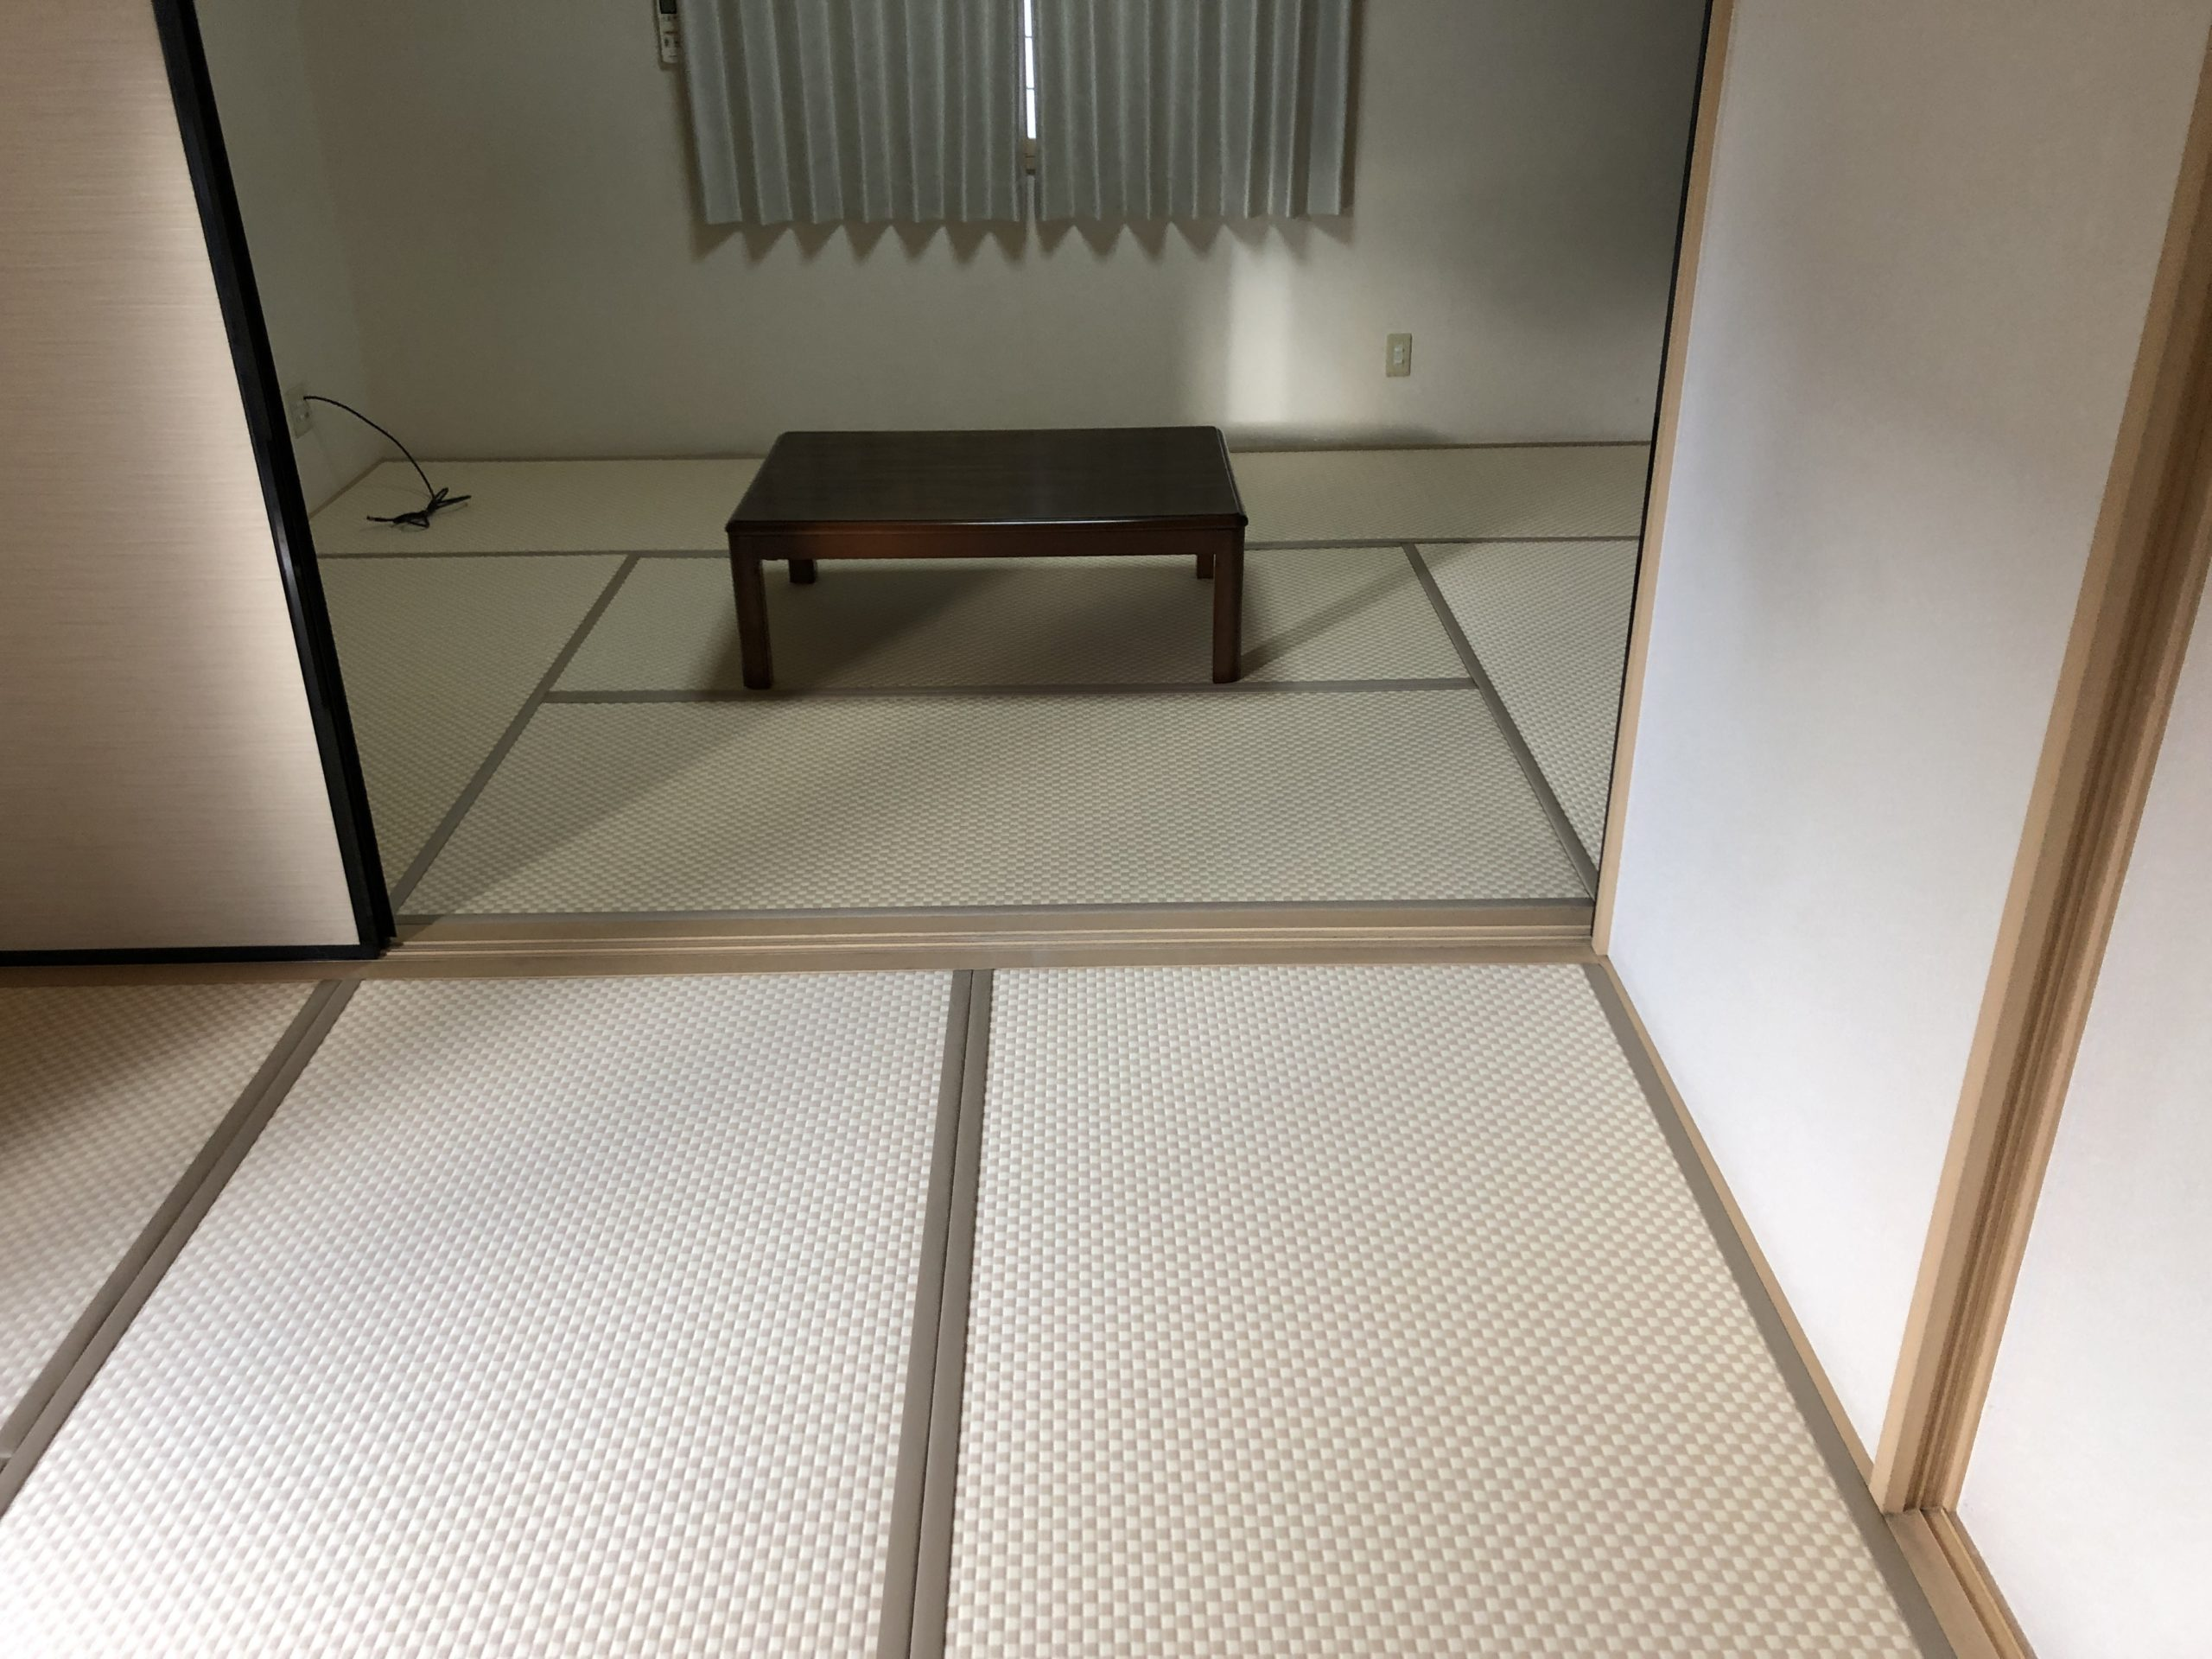 154.薄畳13㎜、表替の画像